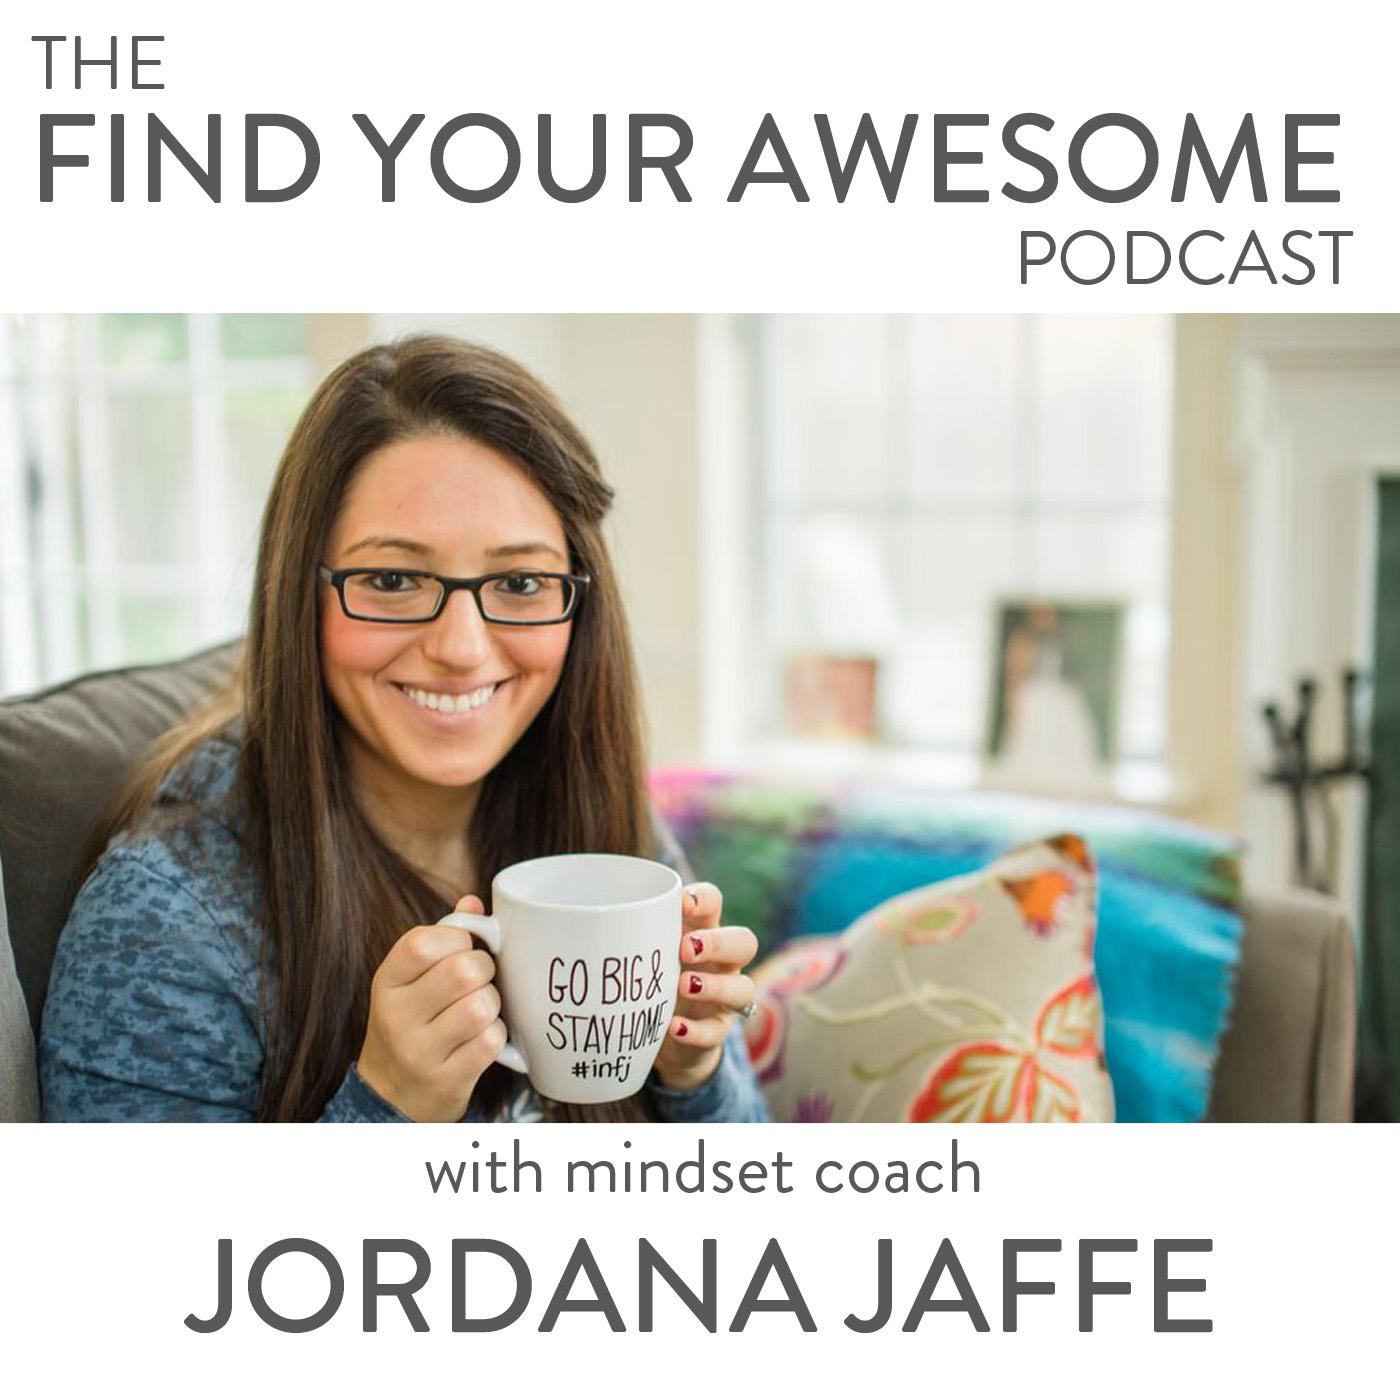 JordanaJaffe_podcast_coverart.jpg